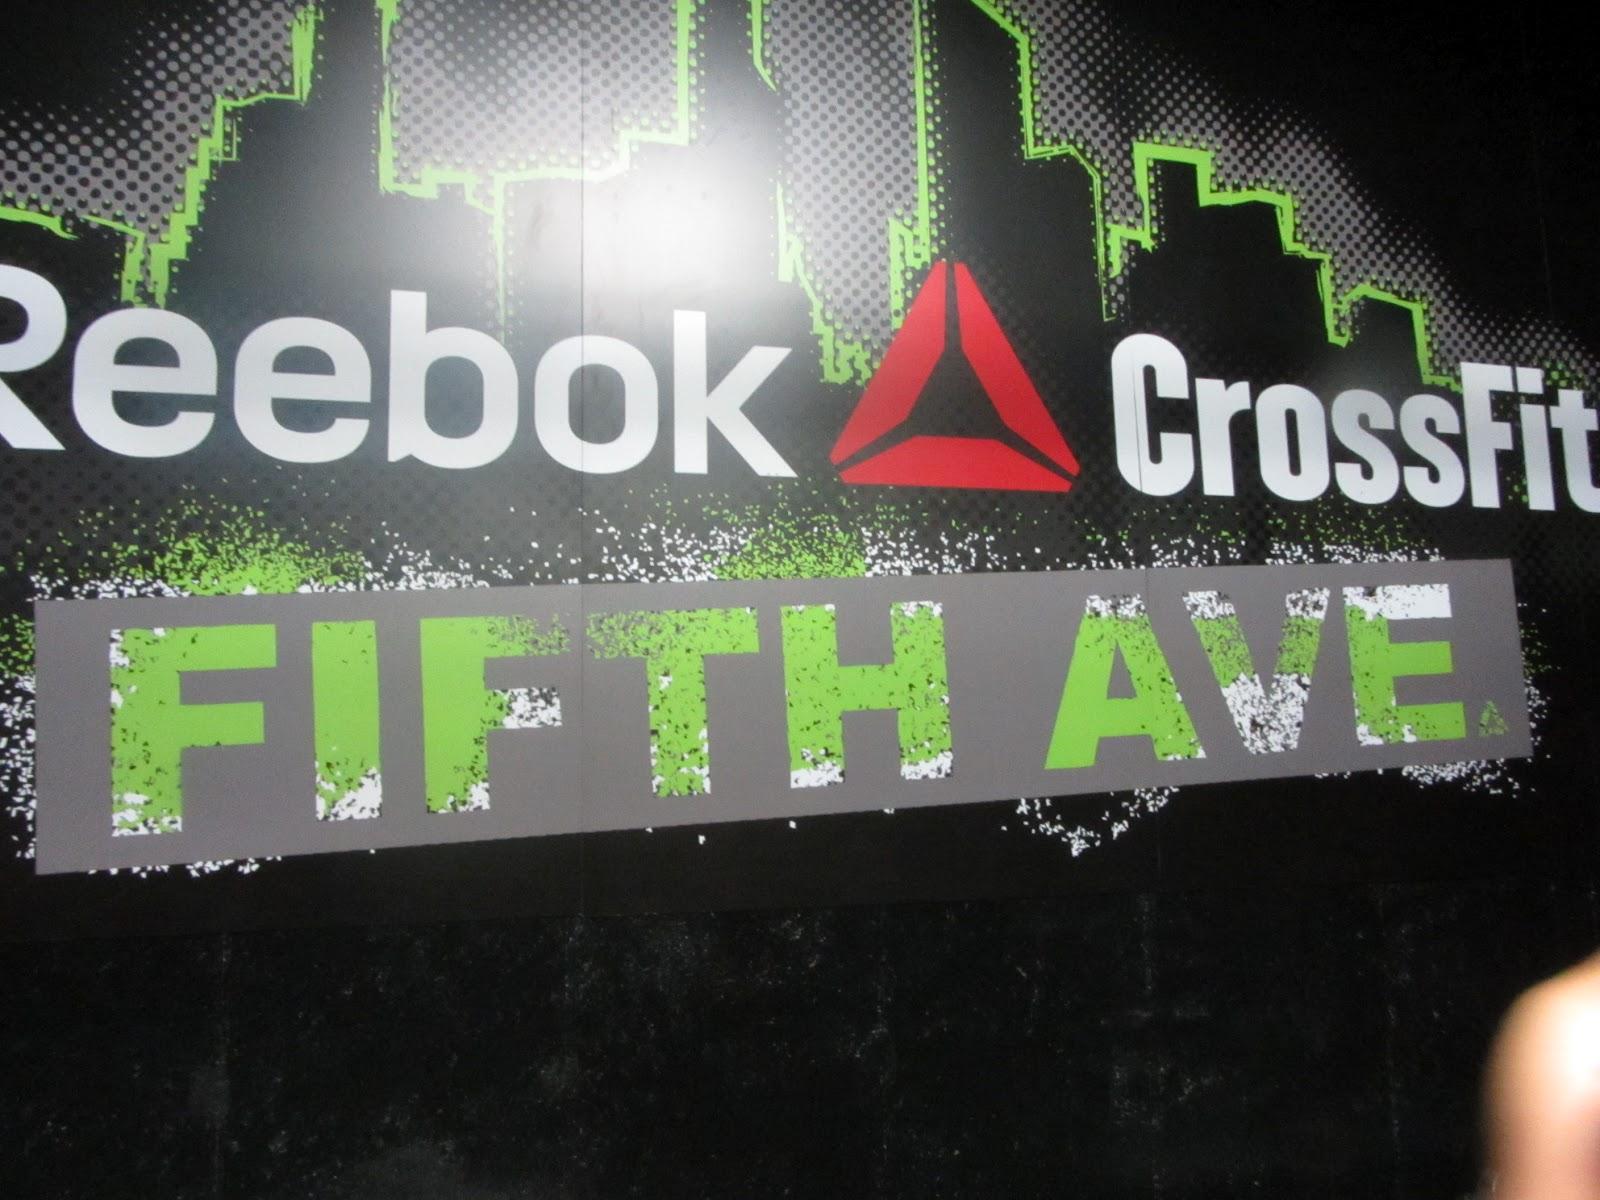 reebok crossfit 5th ave shirts